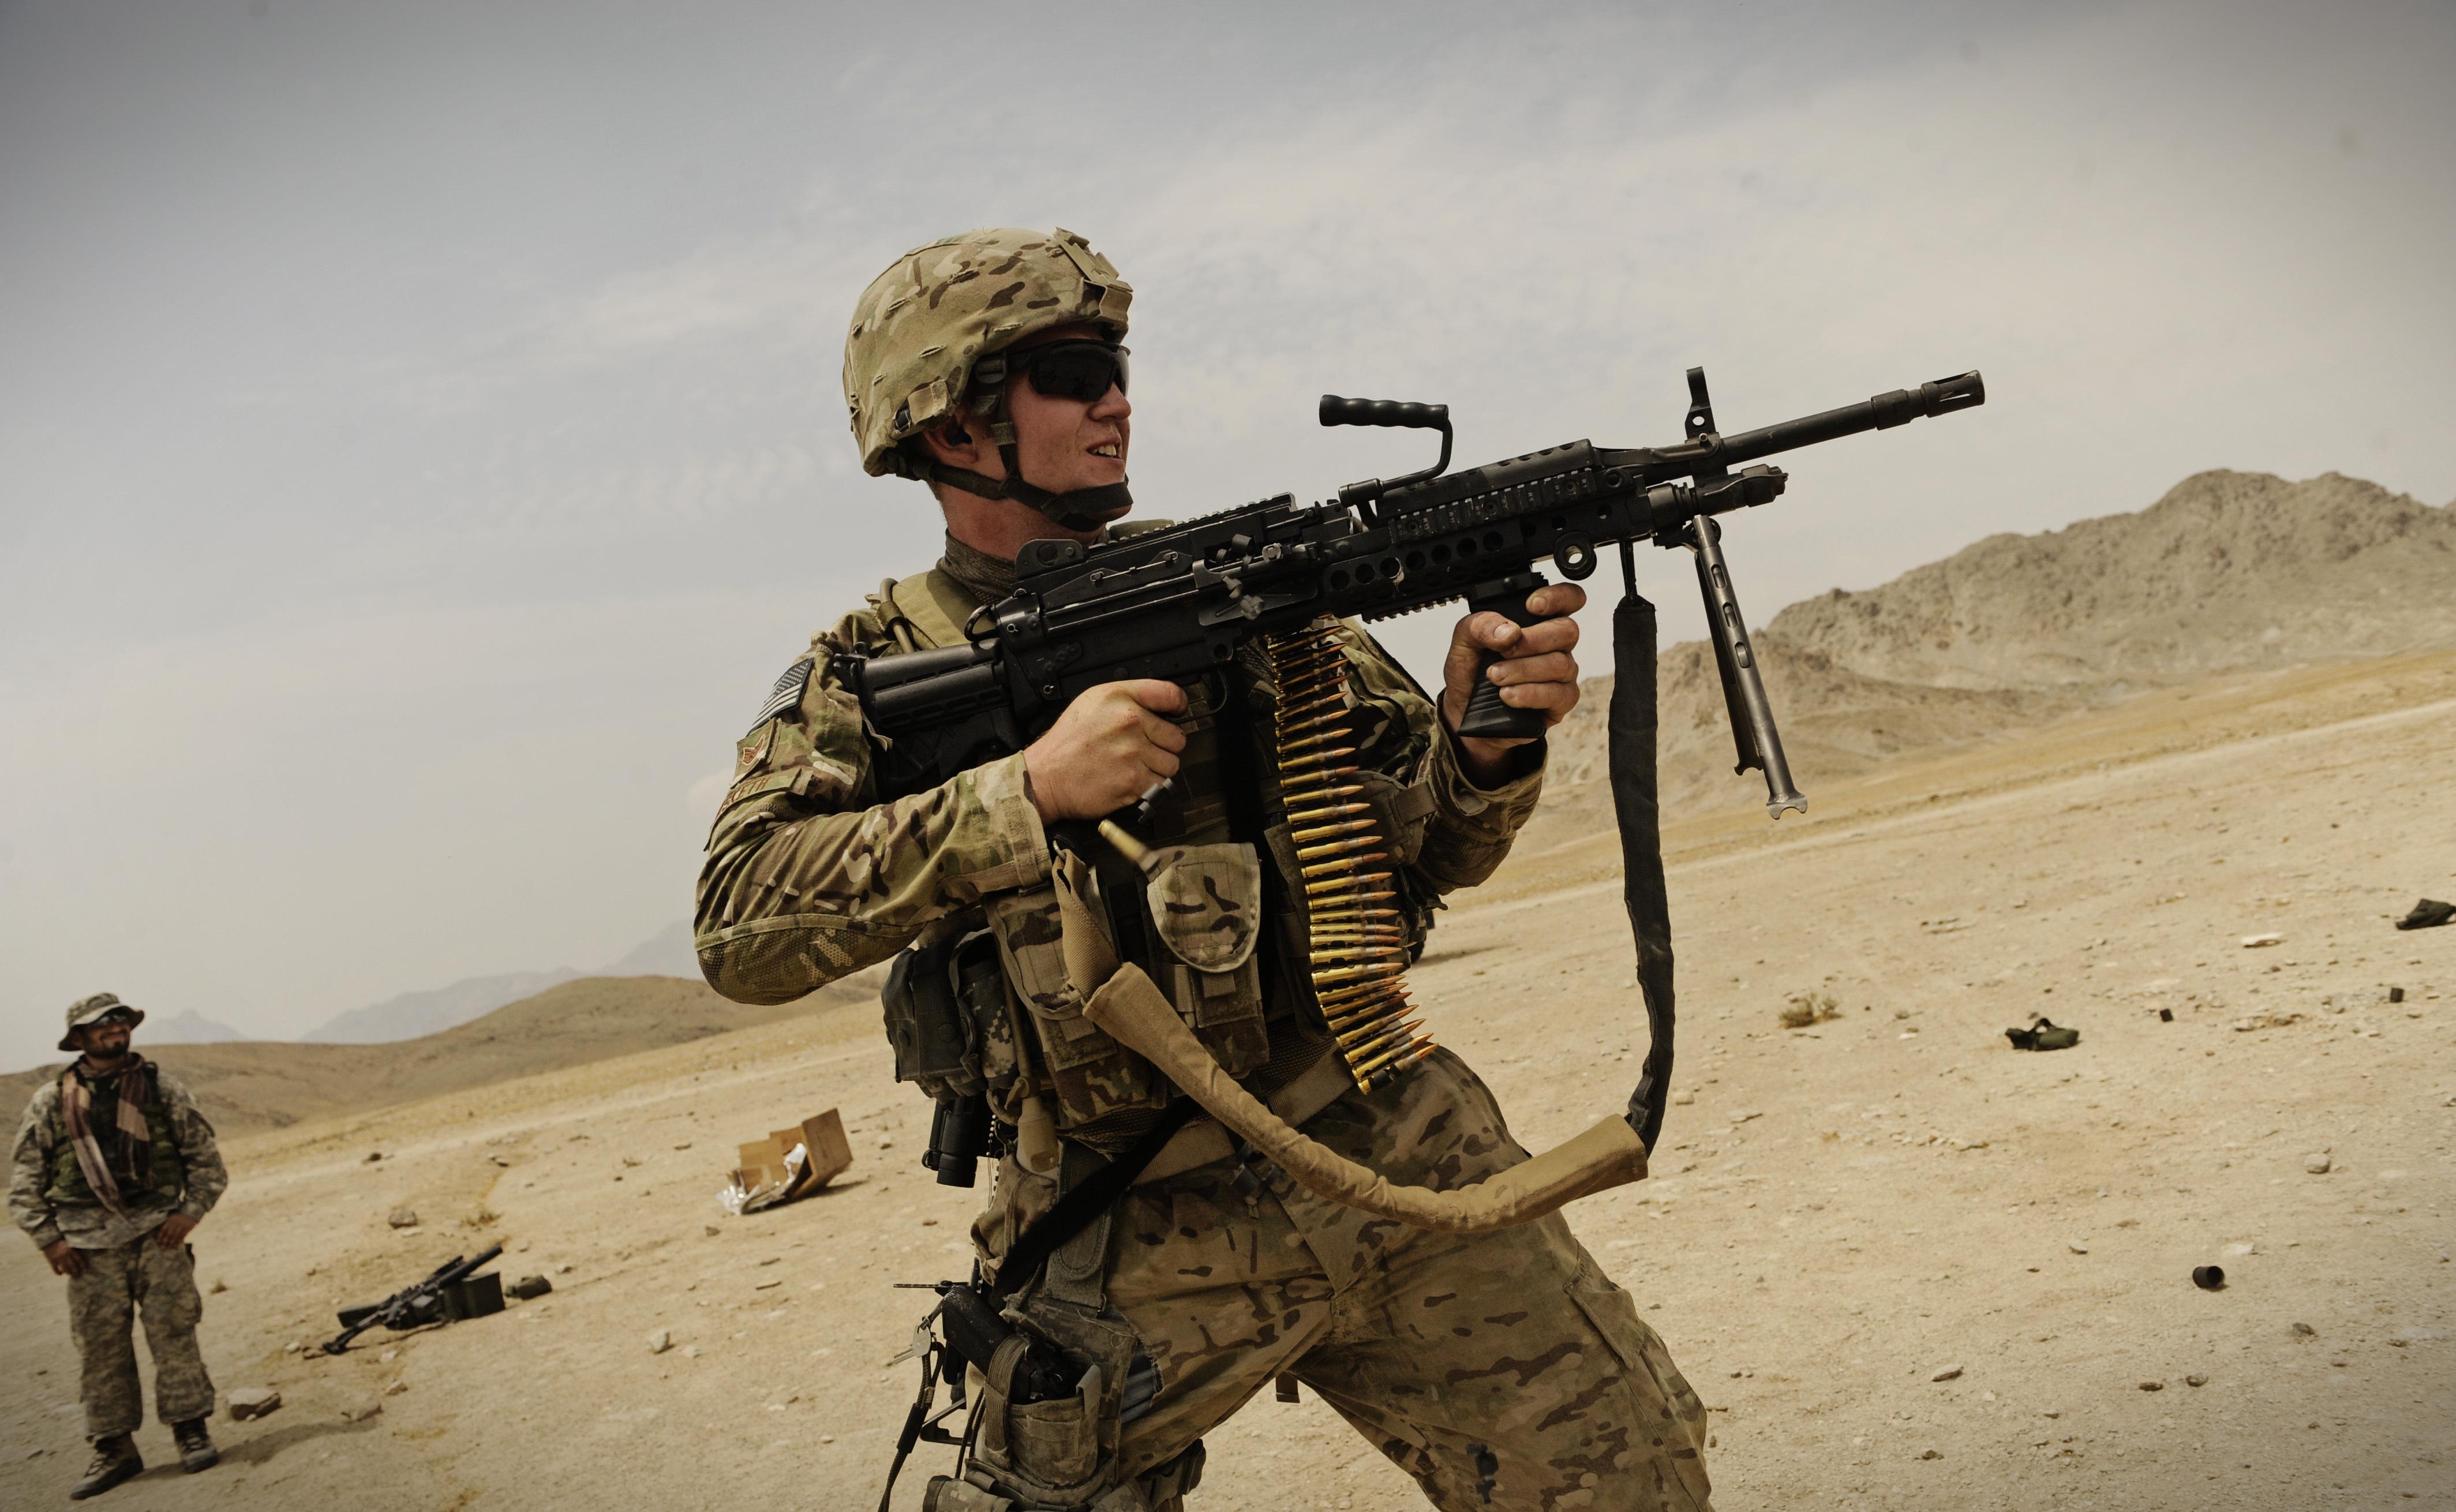 Meet the Super SAW Machine Gun (And Why the U.S. Military Loves It)